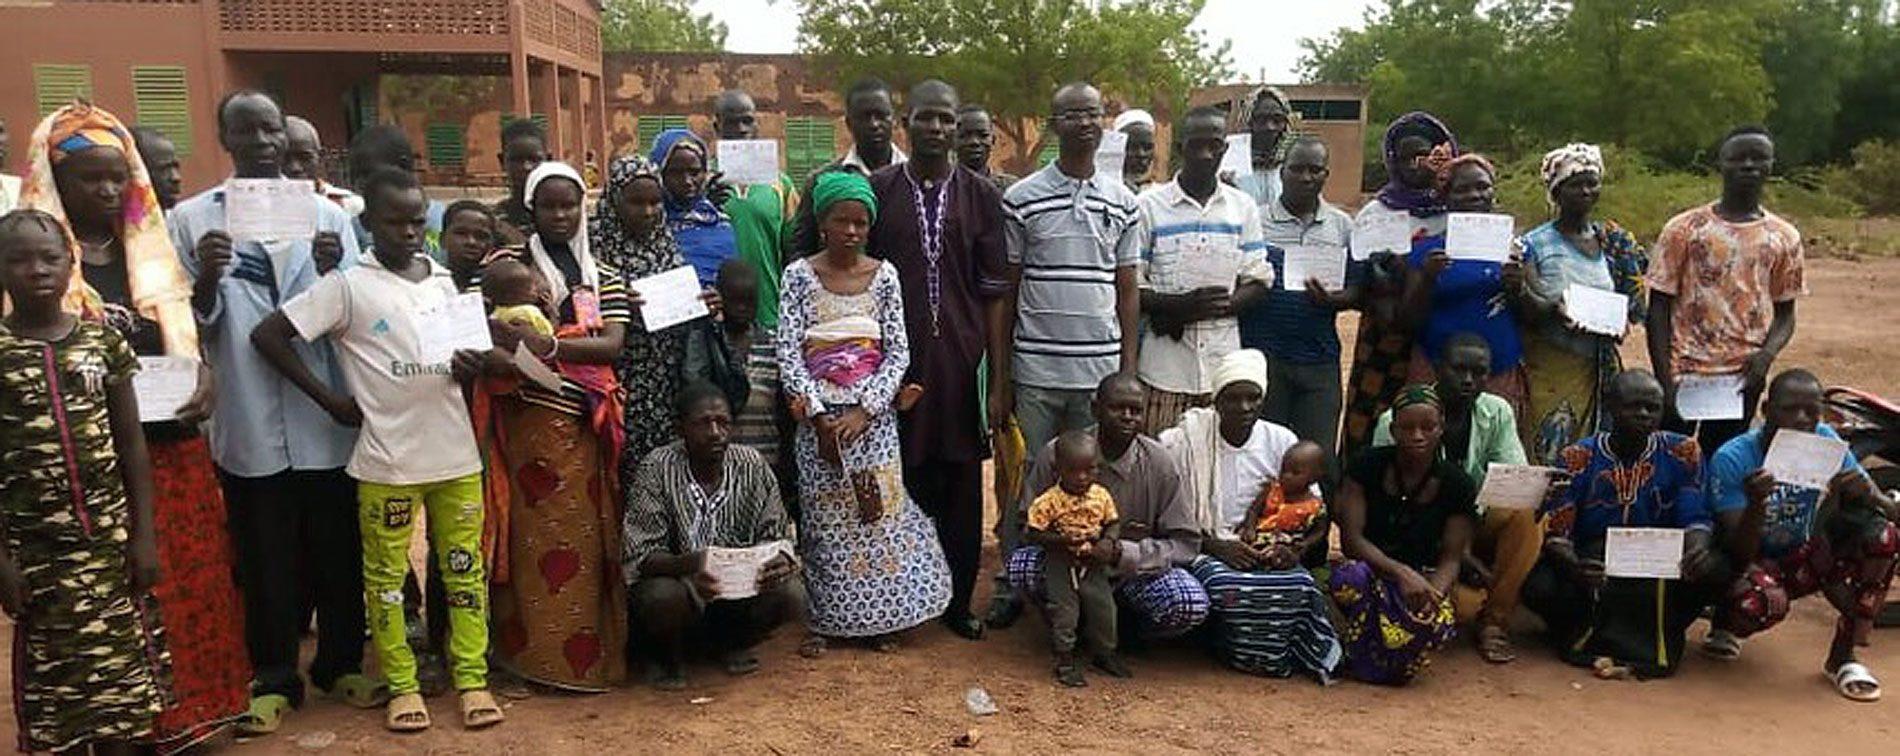 Vertriebene Christen in Burkina Faso